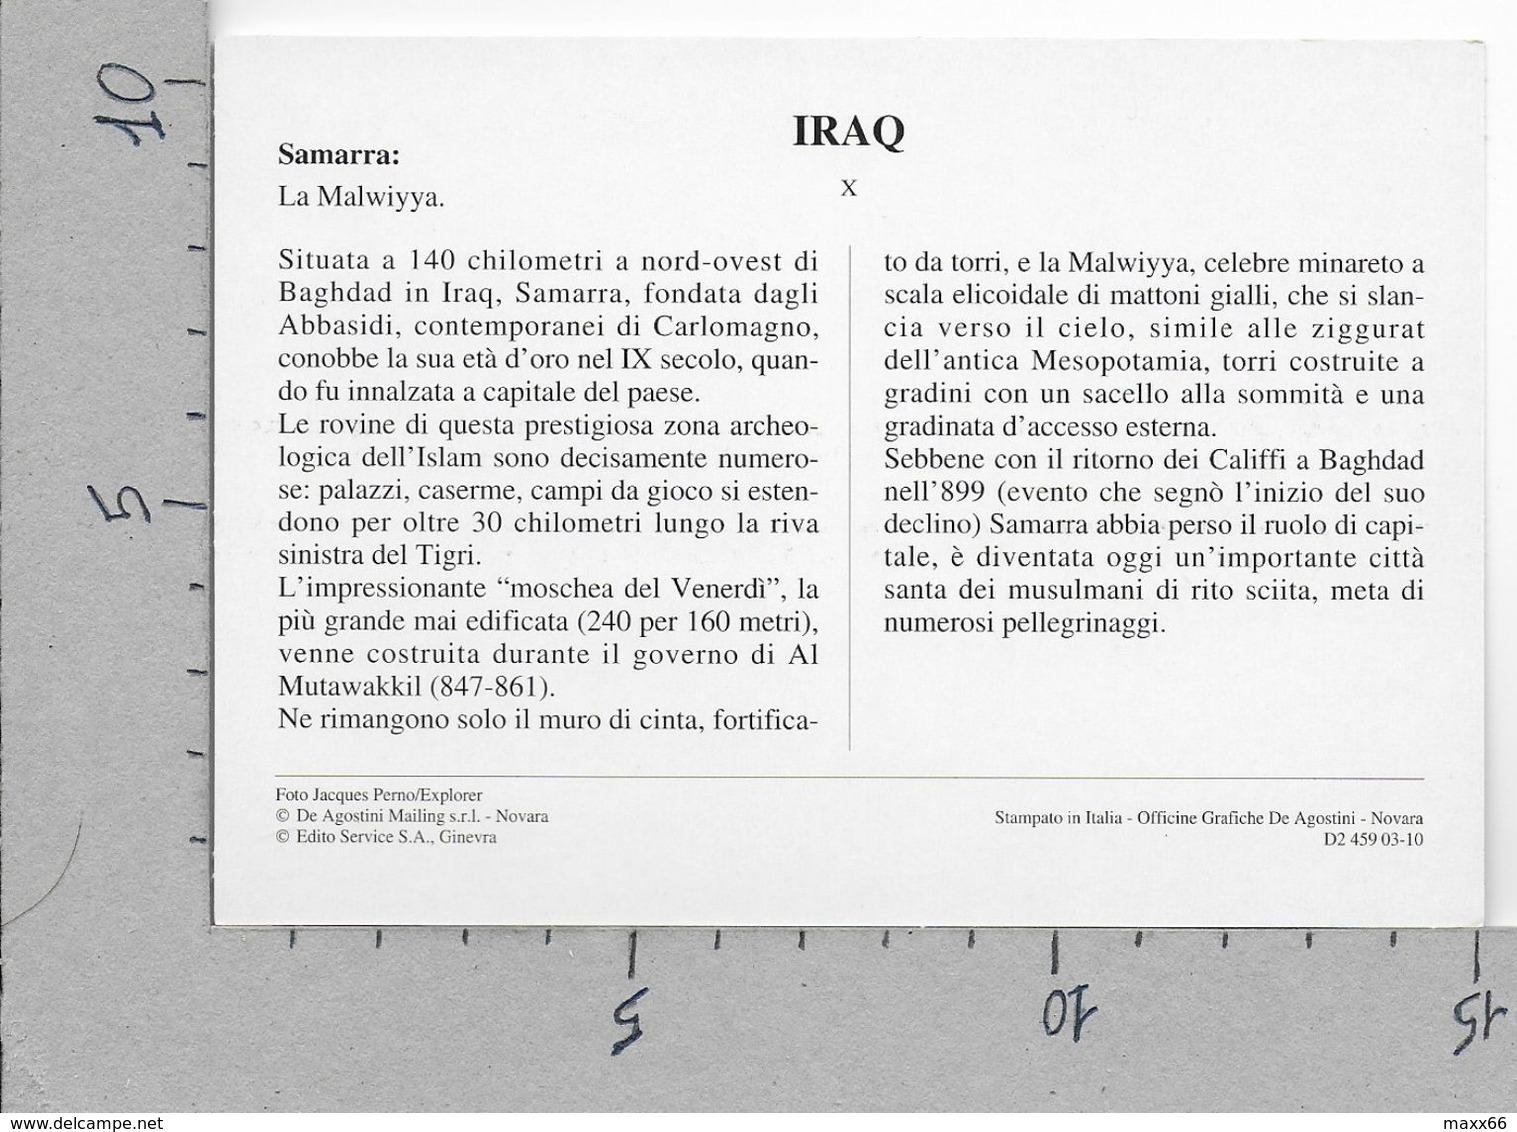 CARTOLINA NV DE AGOSTINI - IRAQ - Samarra - La Malwiyya - Vedute Dal Mondo - 10 X 15 - Iraq